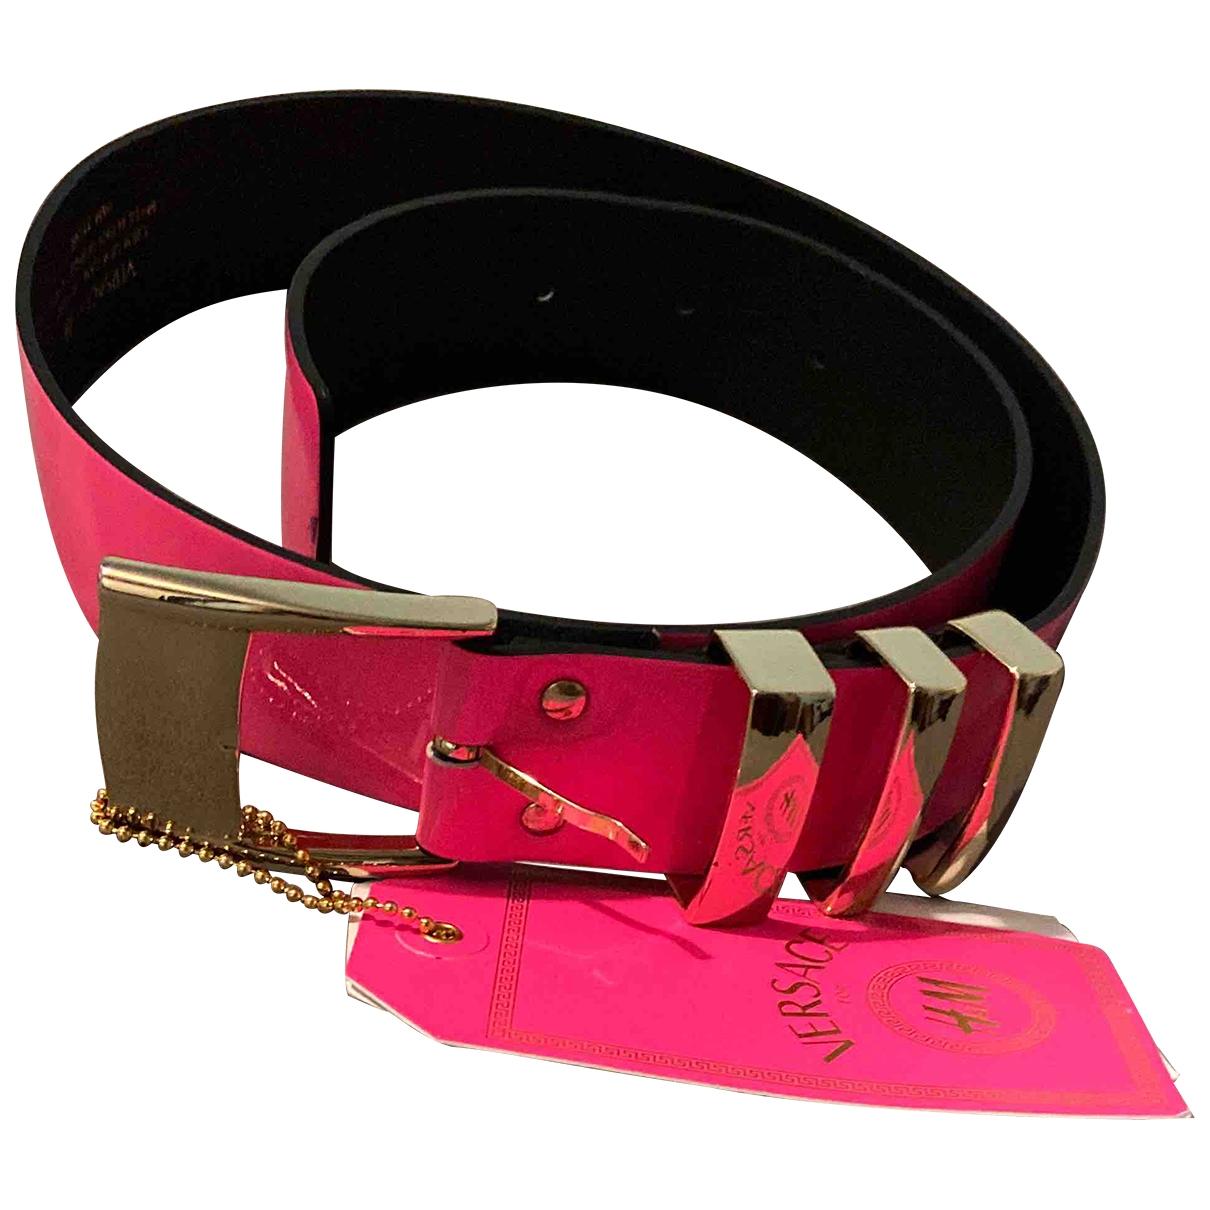 Versace X H&m \N Pink Patent leather belt for Women M International